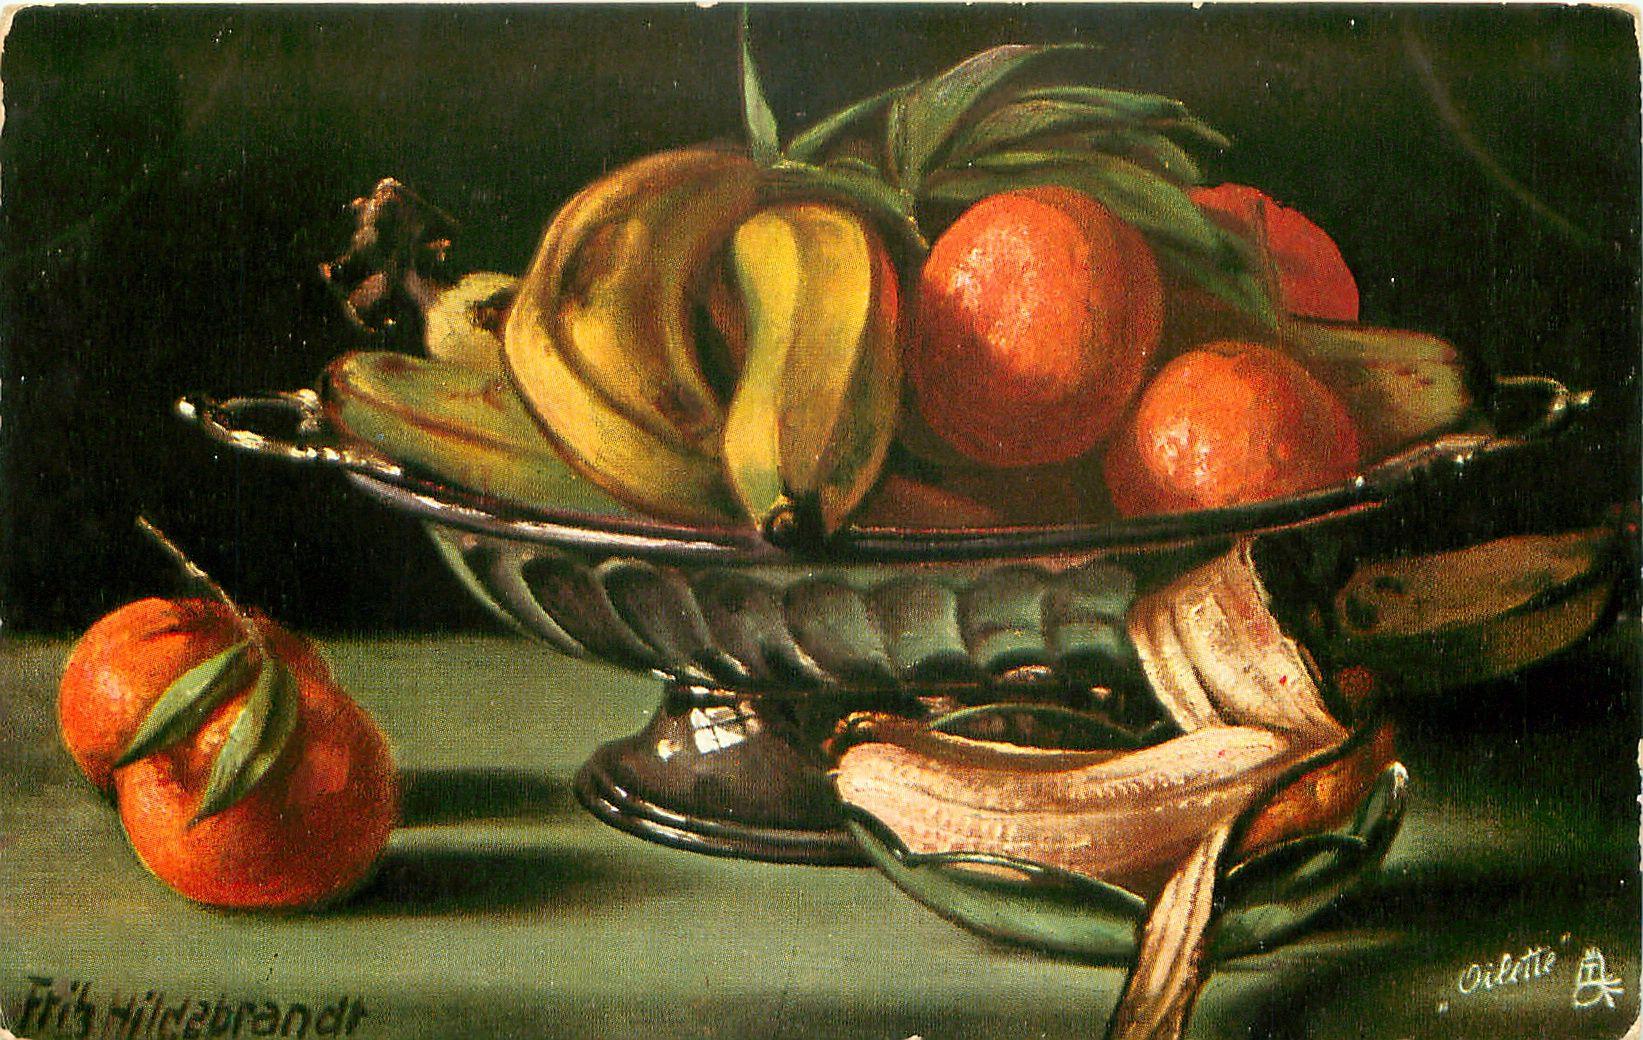 bananas & oranges in & around silver dish